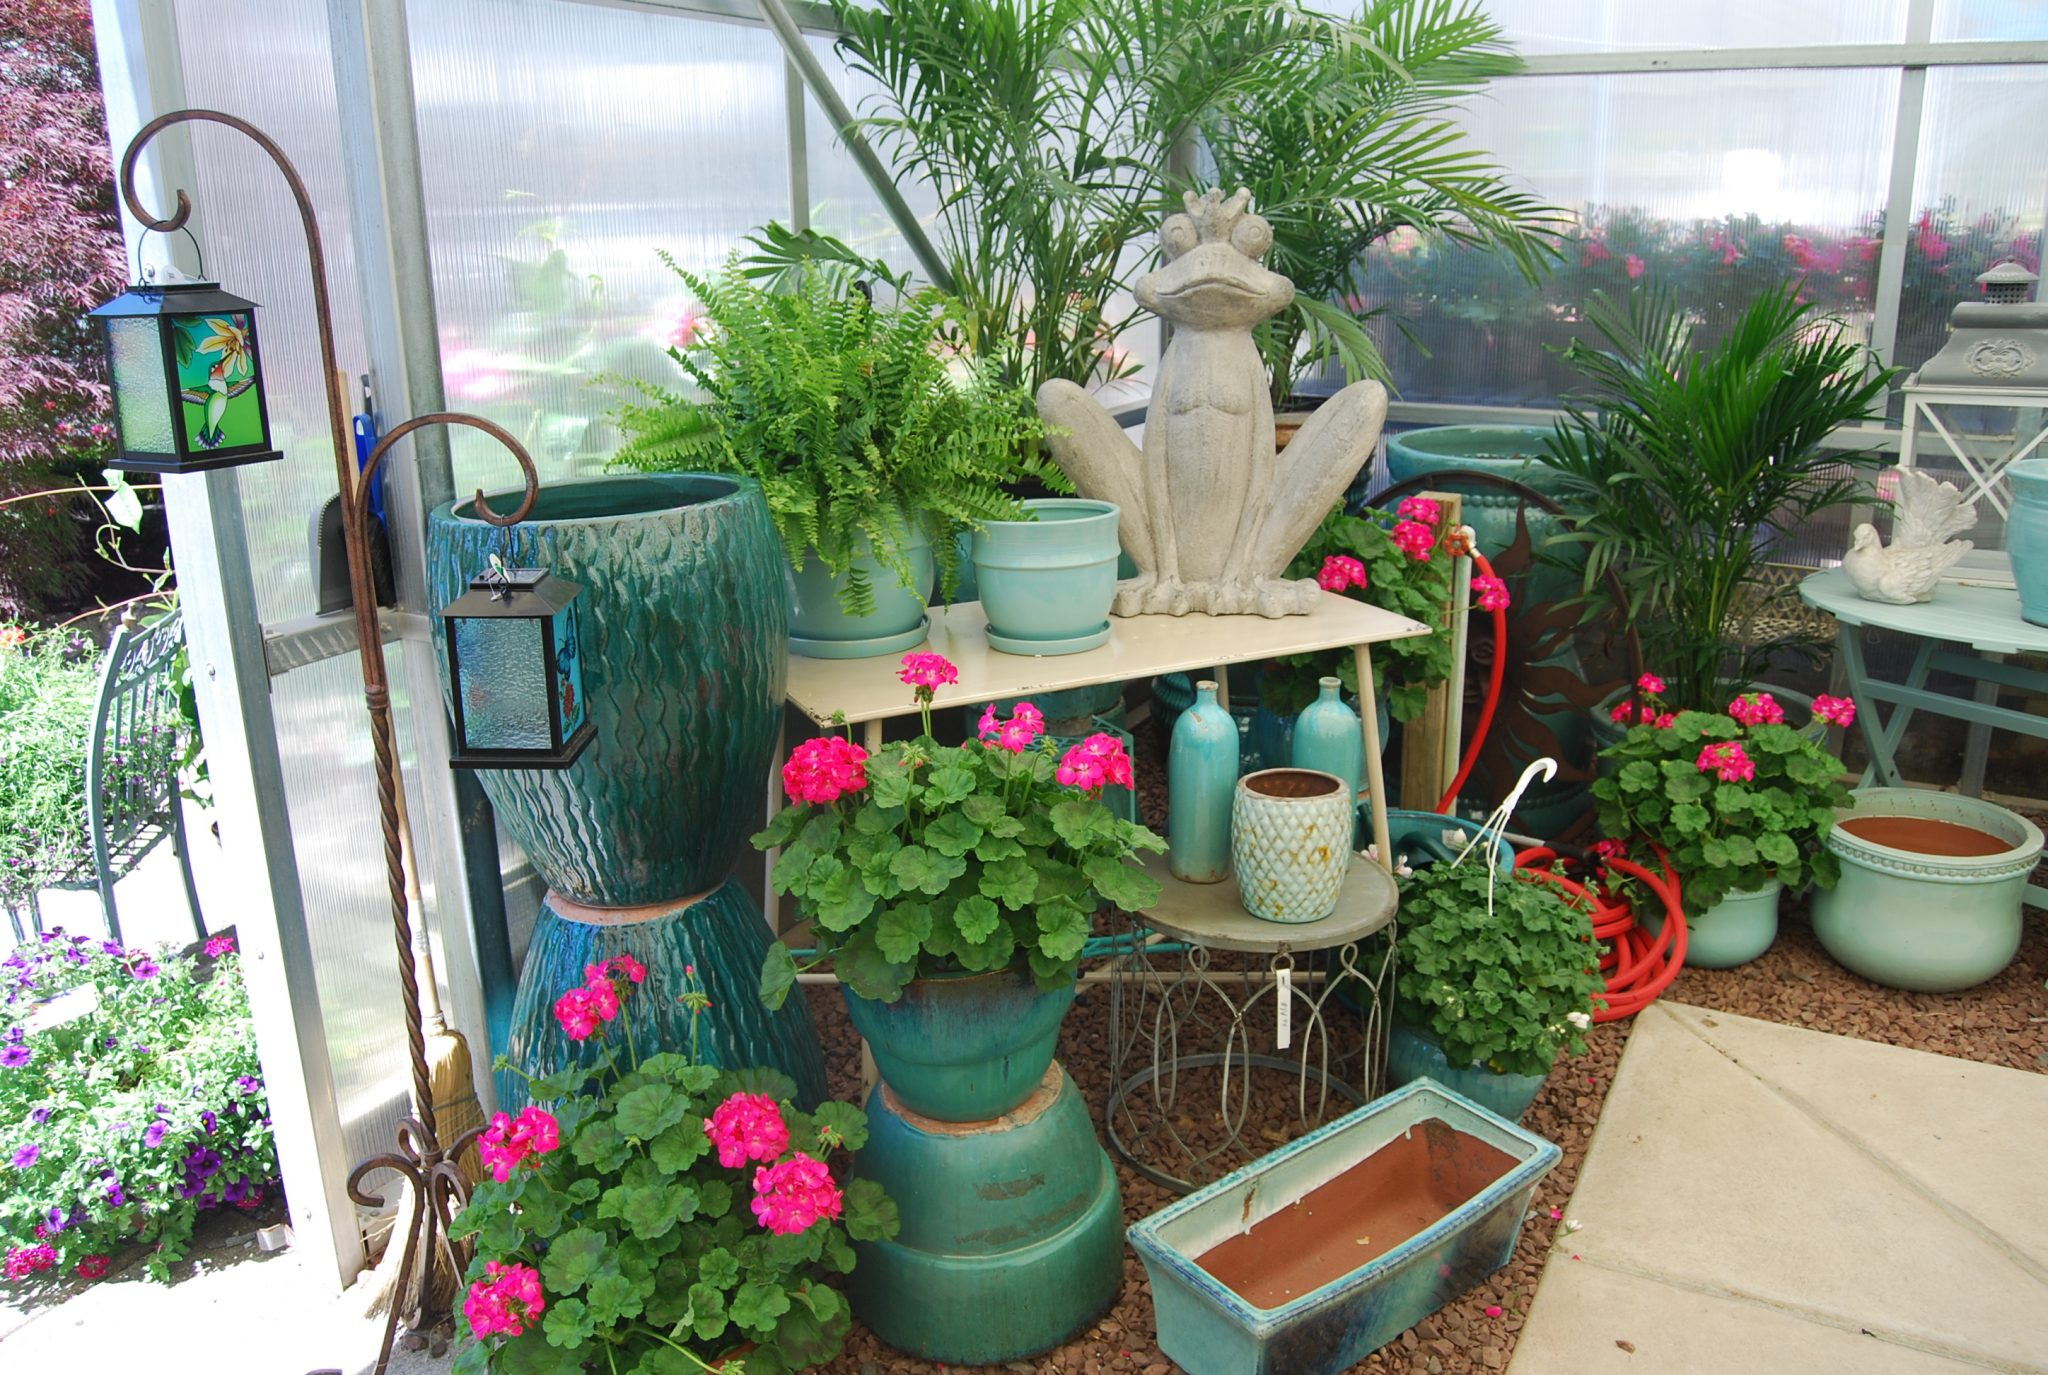 Country Greenery Pottery Potpourri